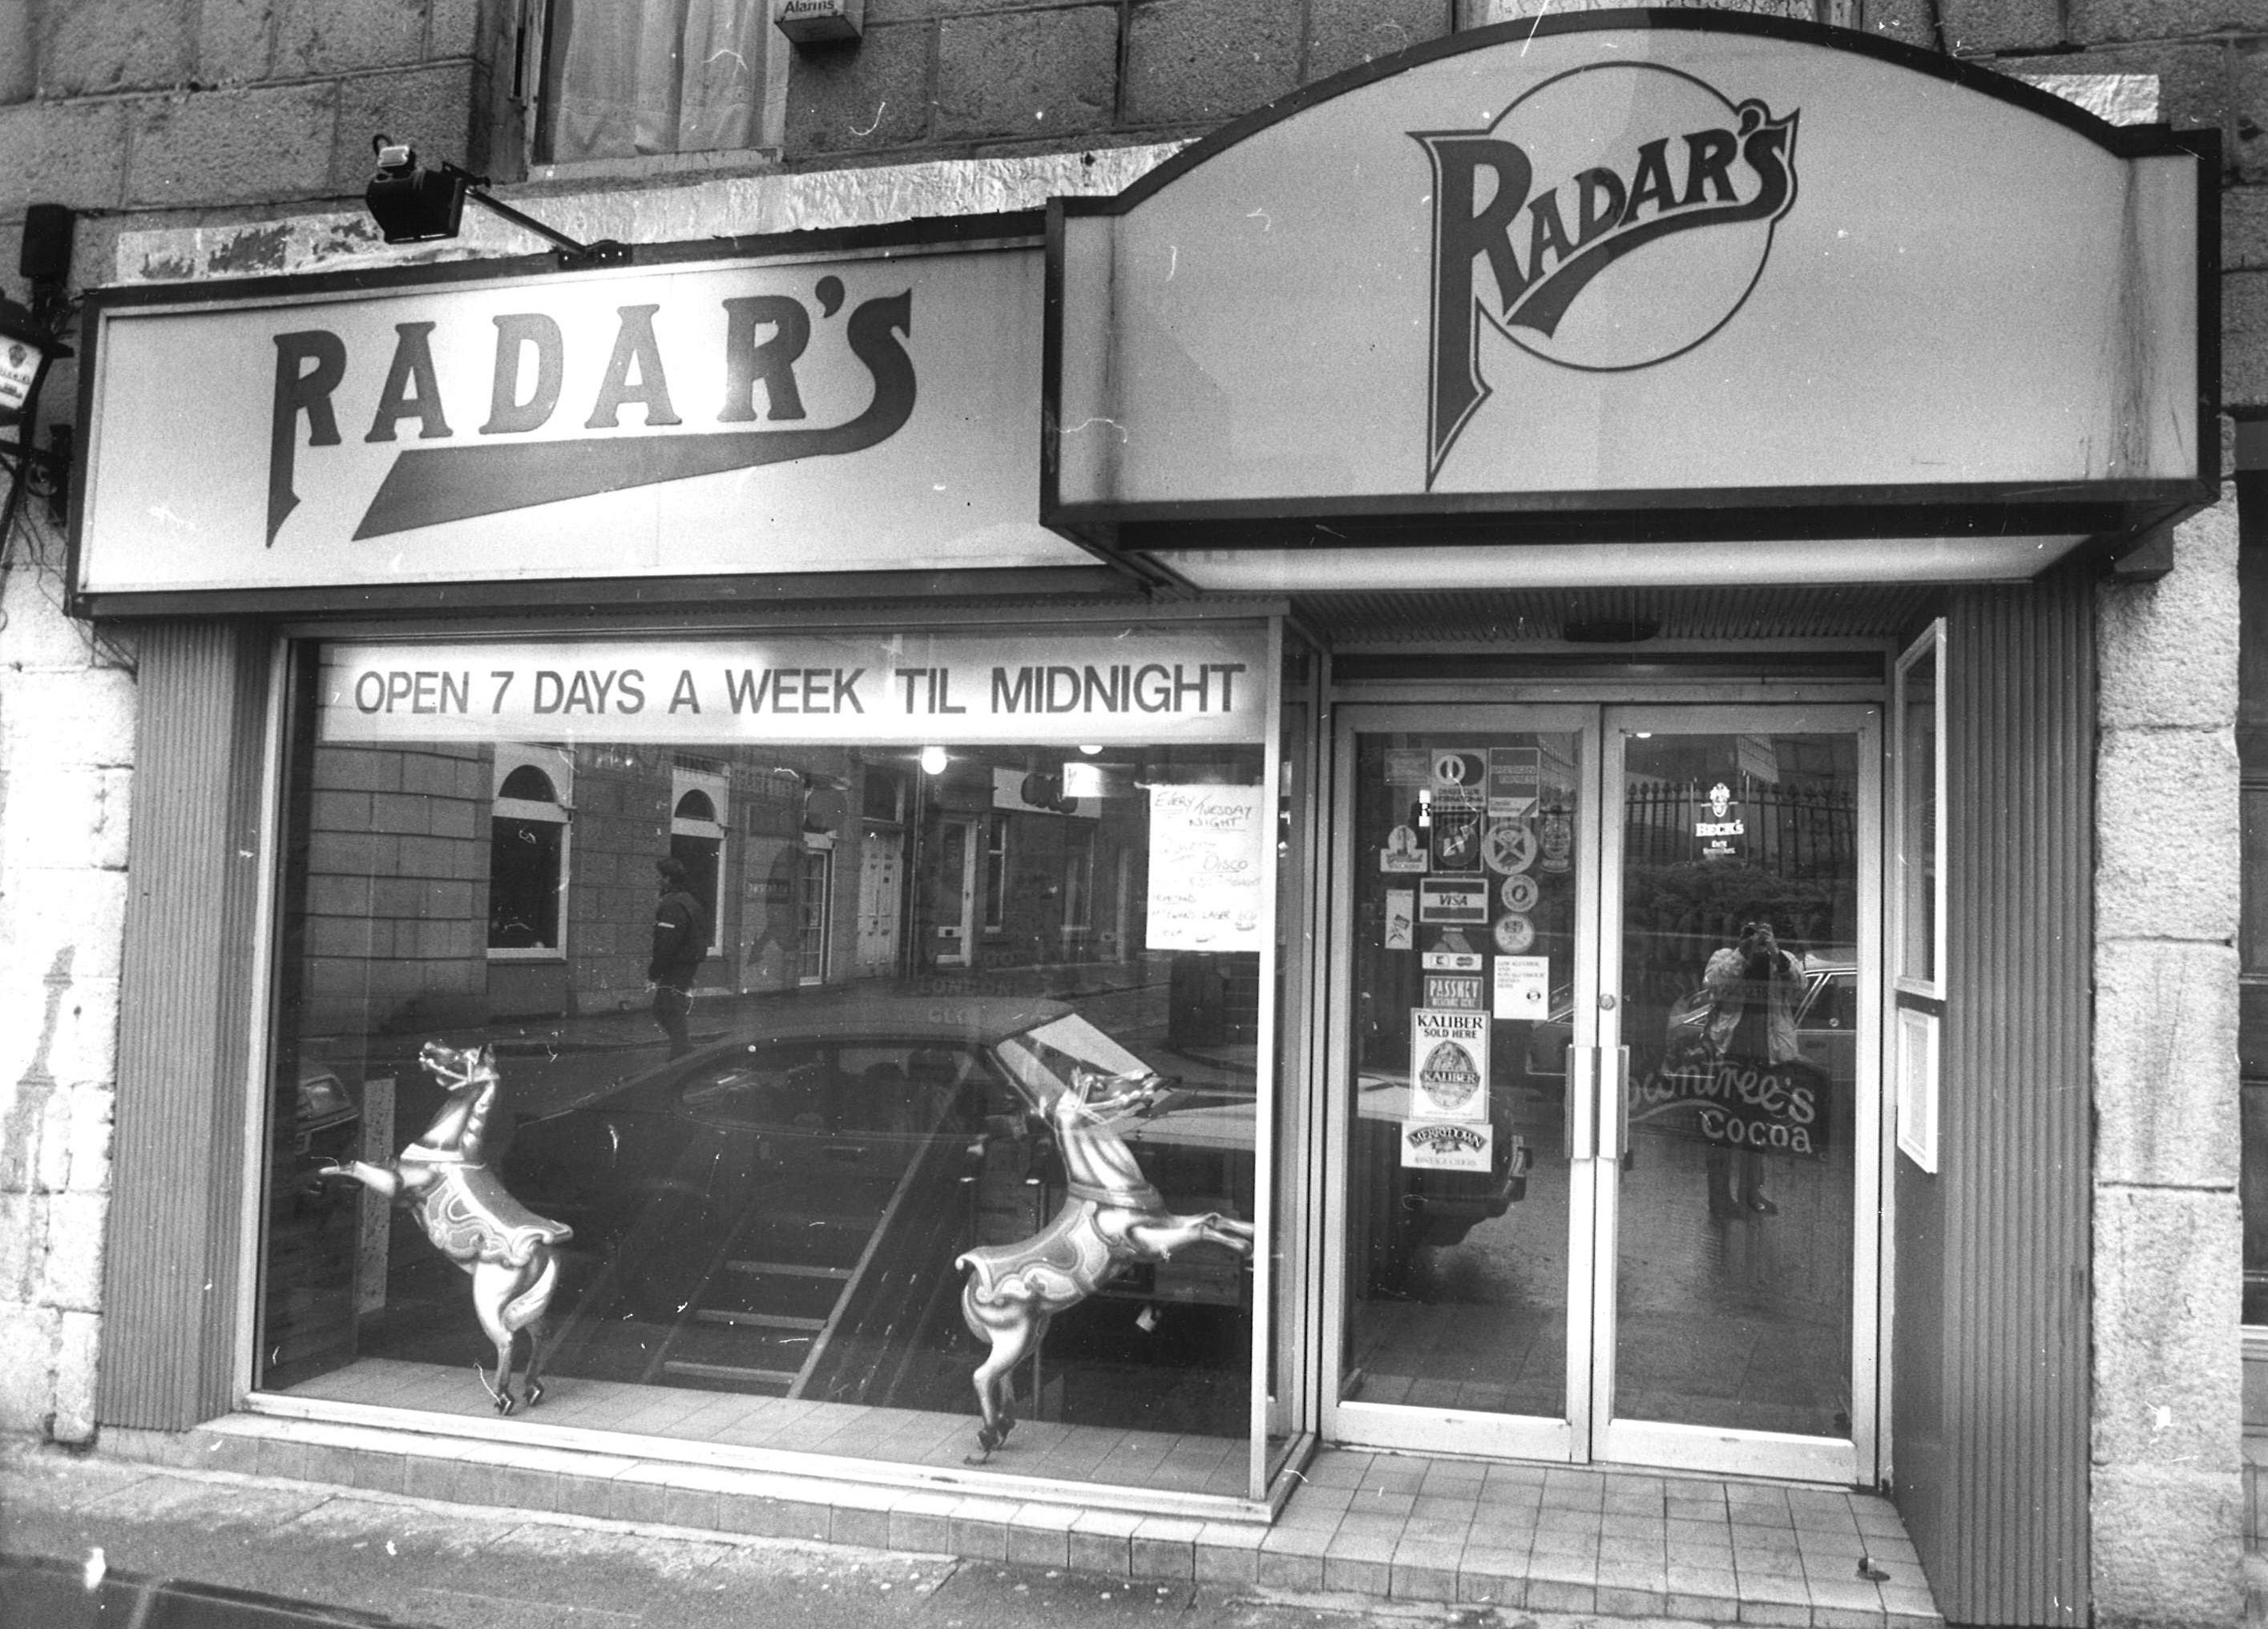 Radar's